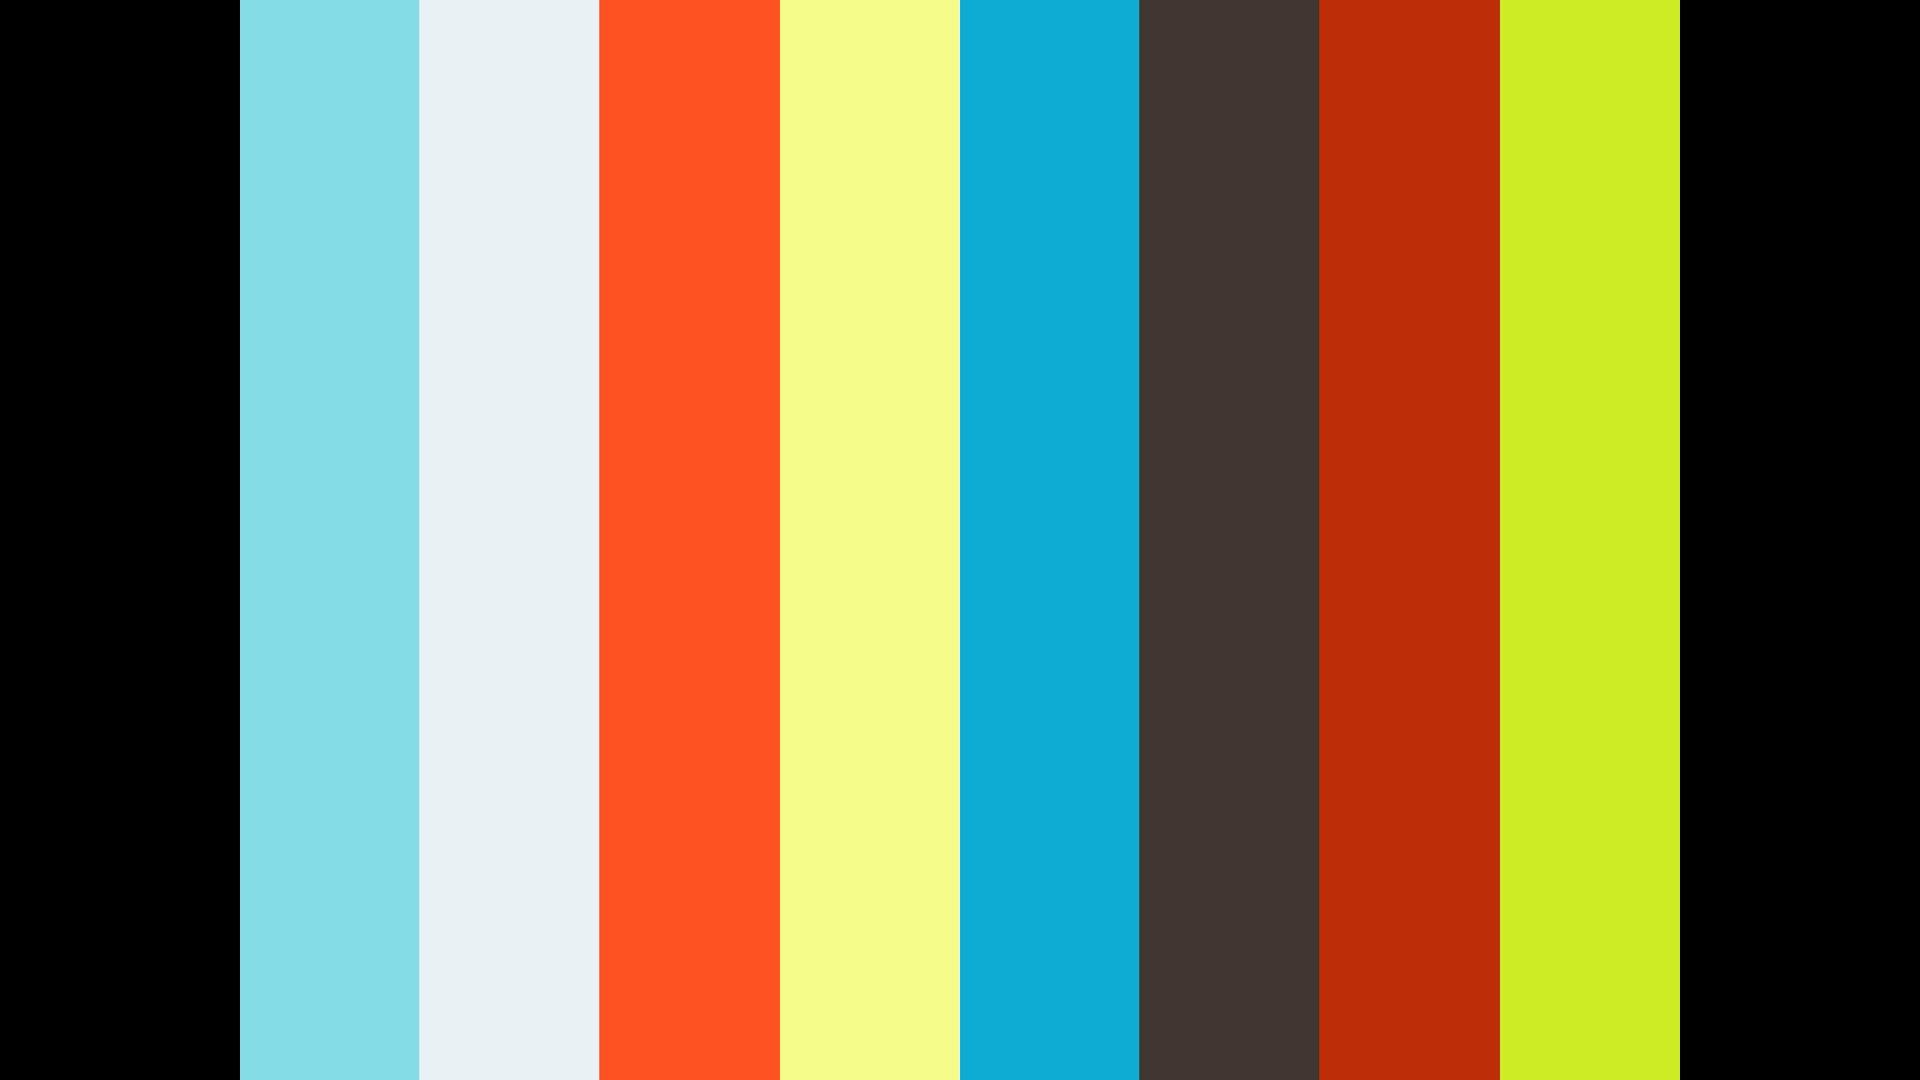 Programme(s) Commun(s) 2020 : Semaine 3 (teaser)